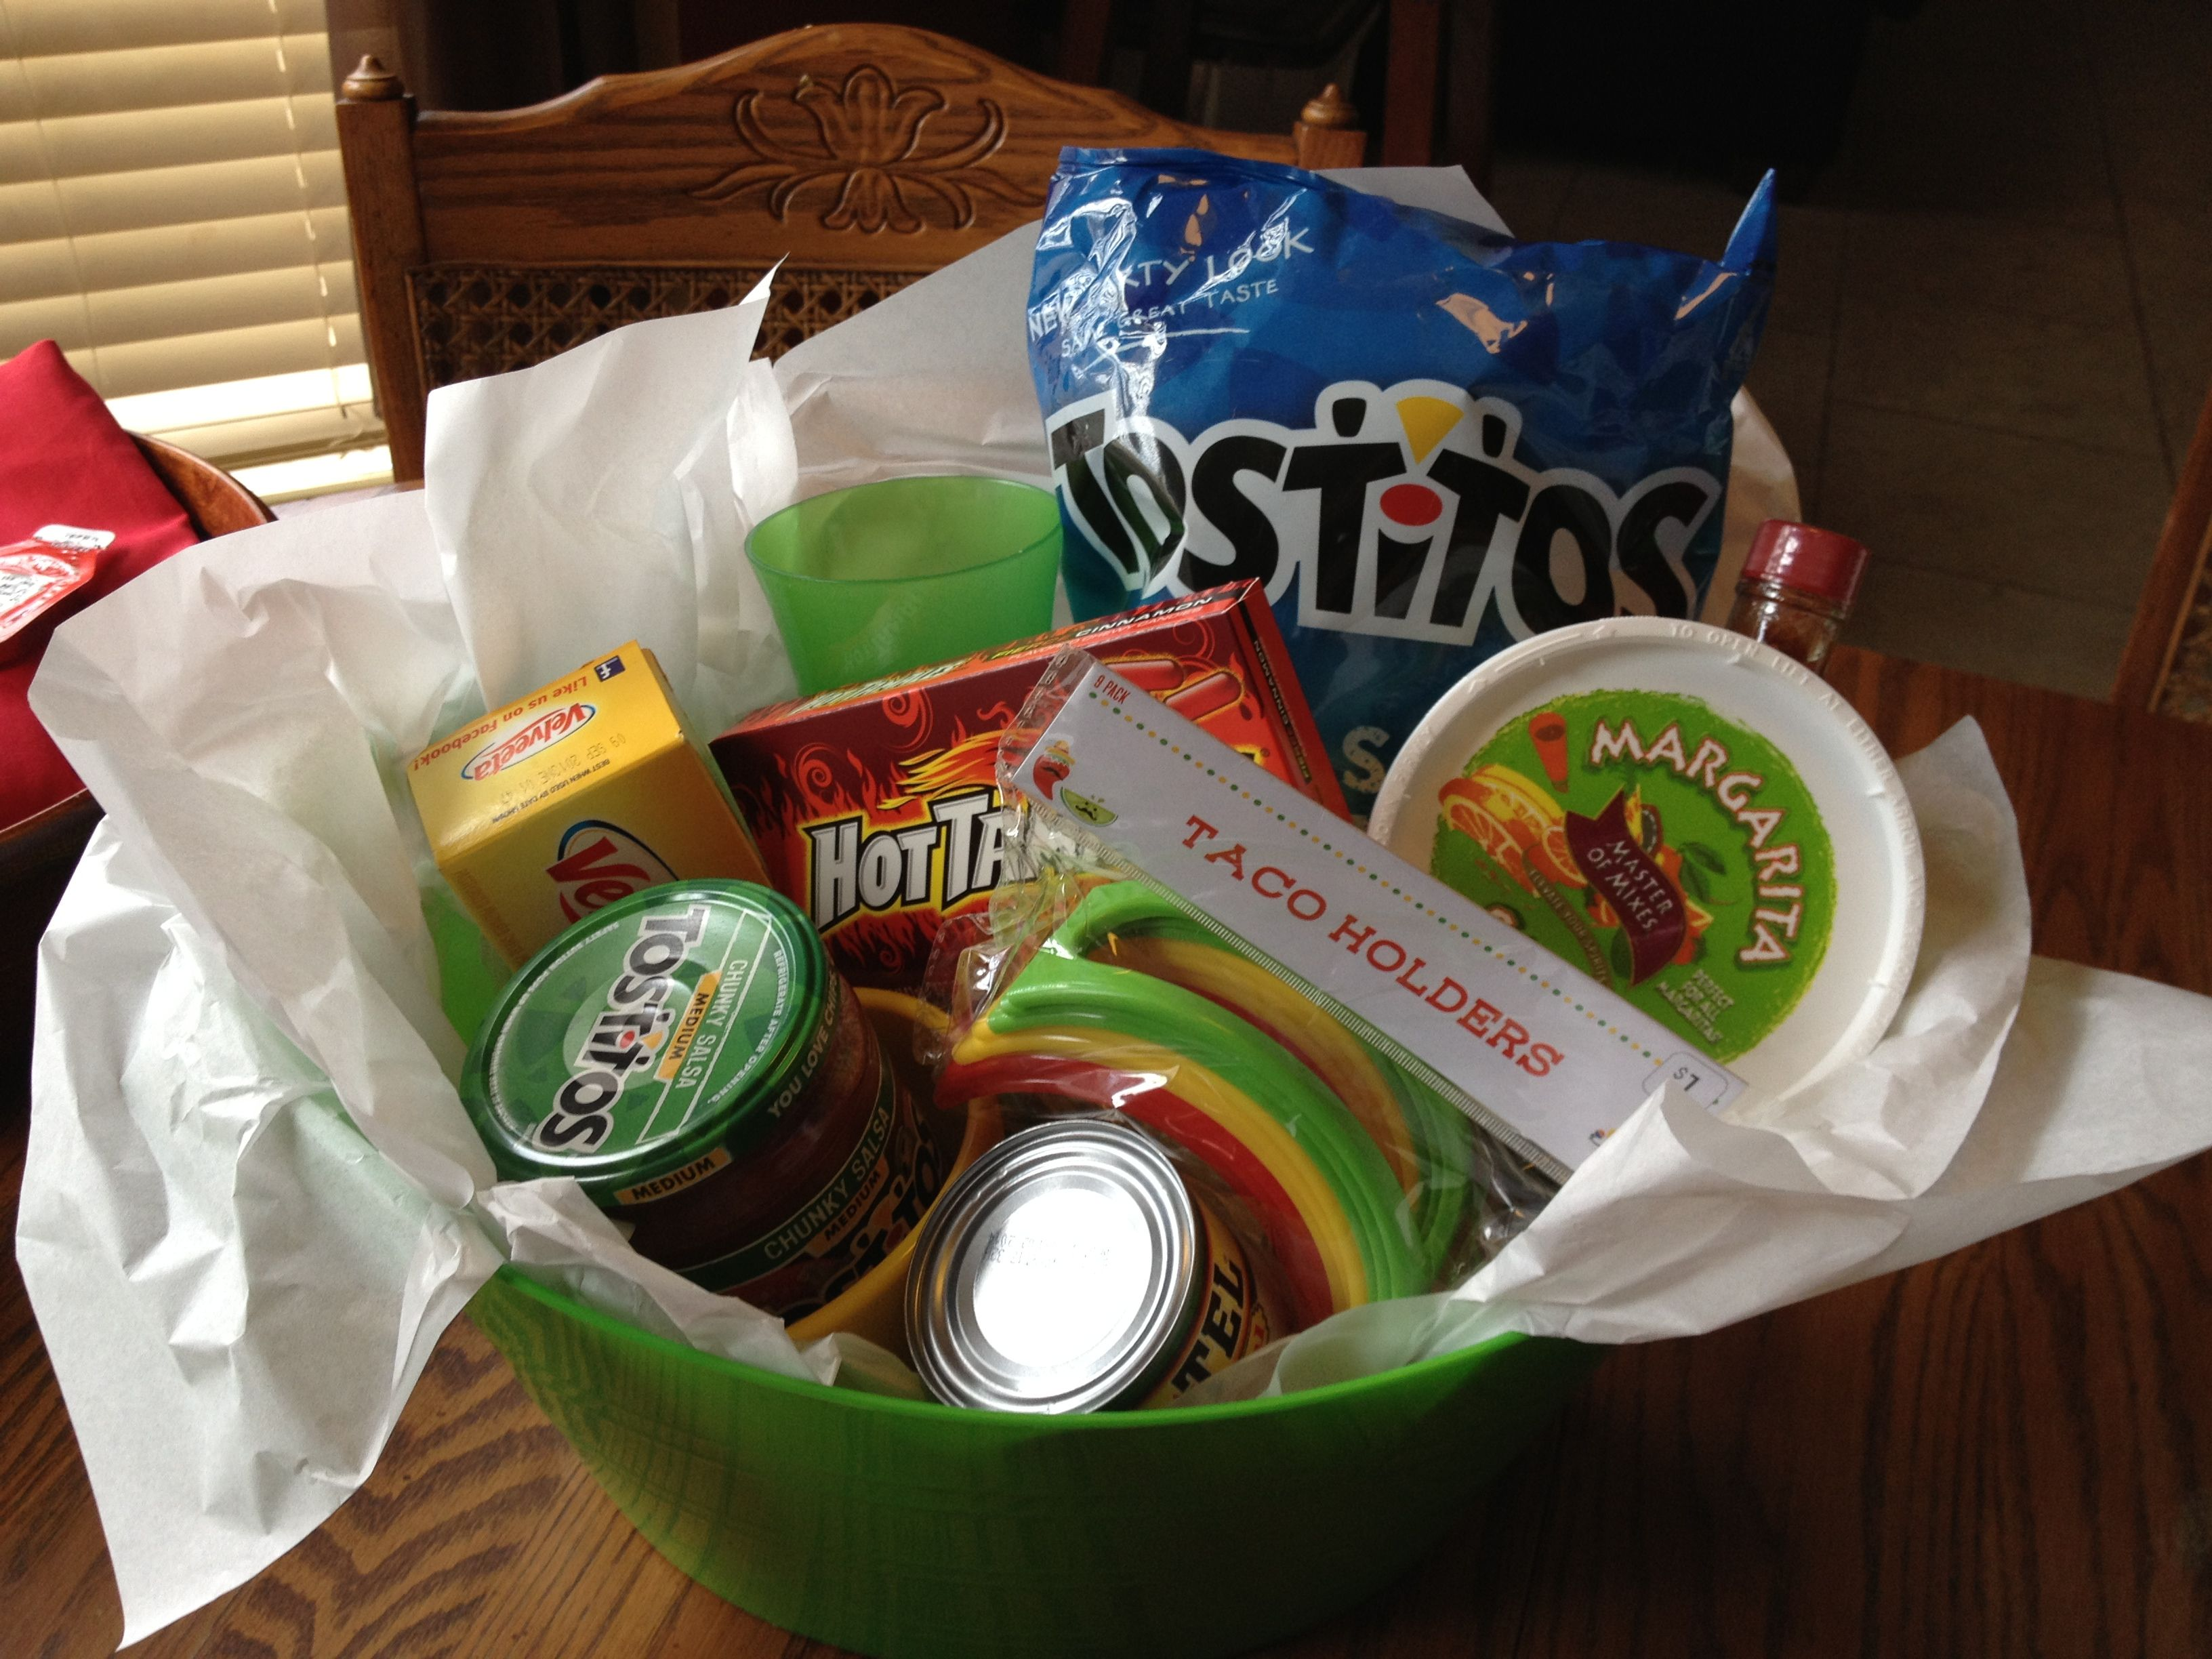 Office ideas for cinco de mayo - Cinco De Mayo Themed Basket Bunko Prize Or Great For Raffles